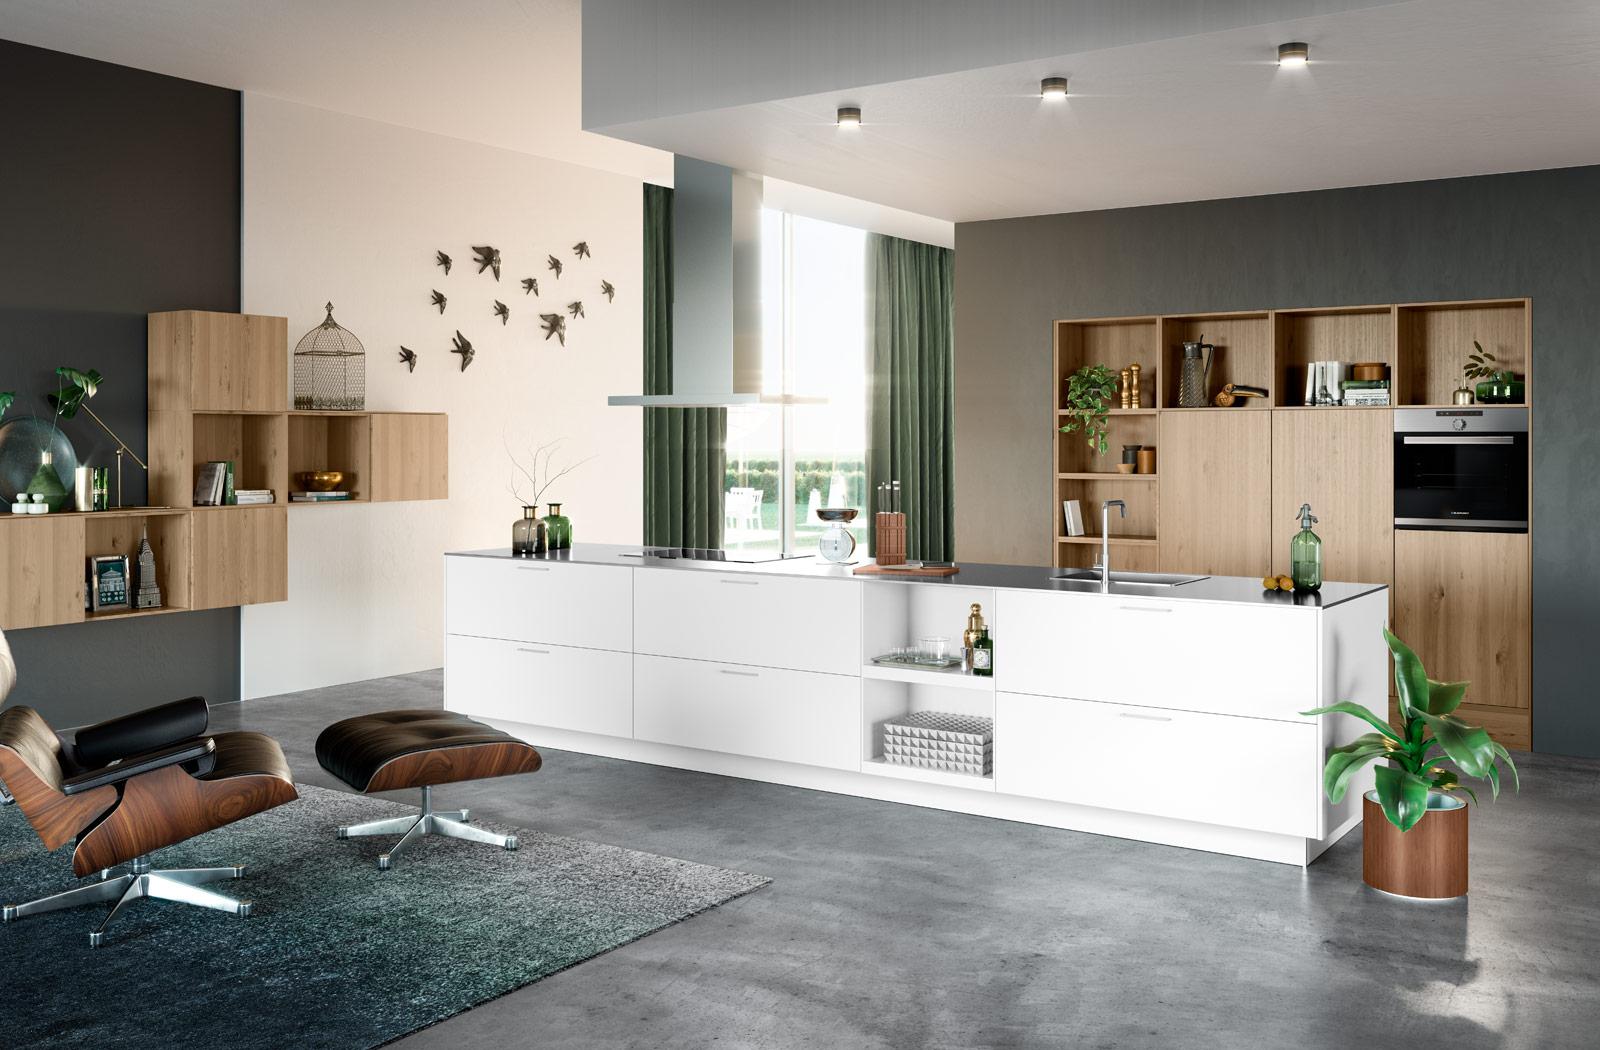 HÄCKER SYSTEMAT: Häcker Systemat Küchen vergleichen + Häcker ...